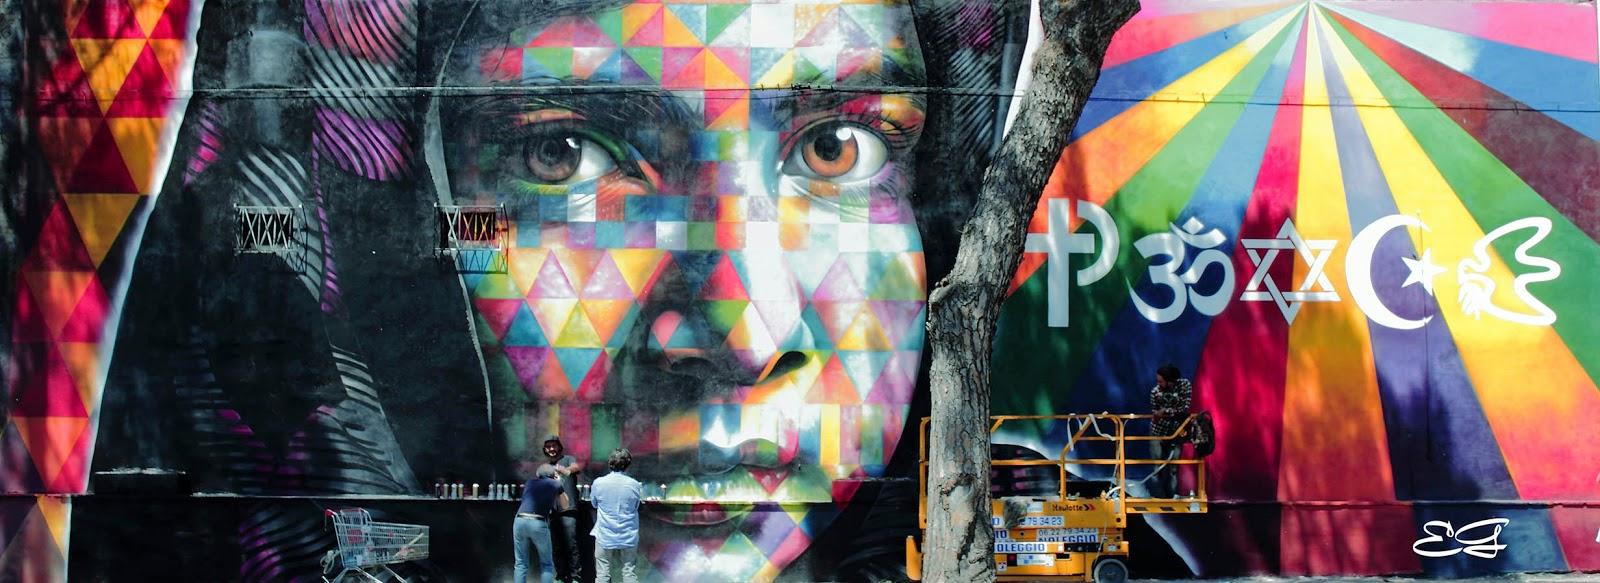 Eduardo kobra peace new mural rome italy for Mural eduardo kobra